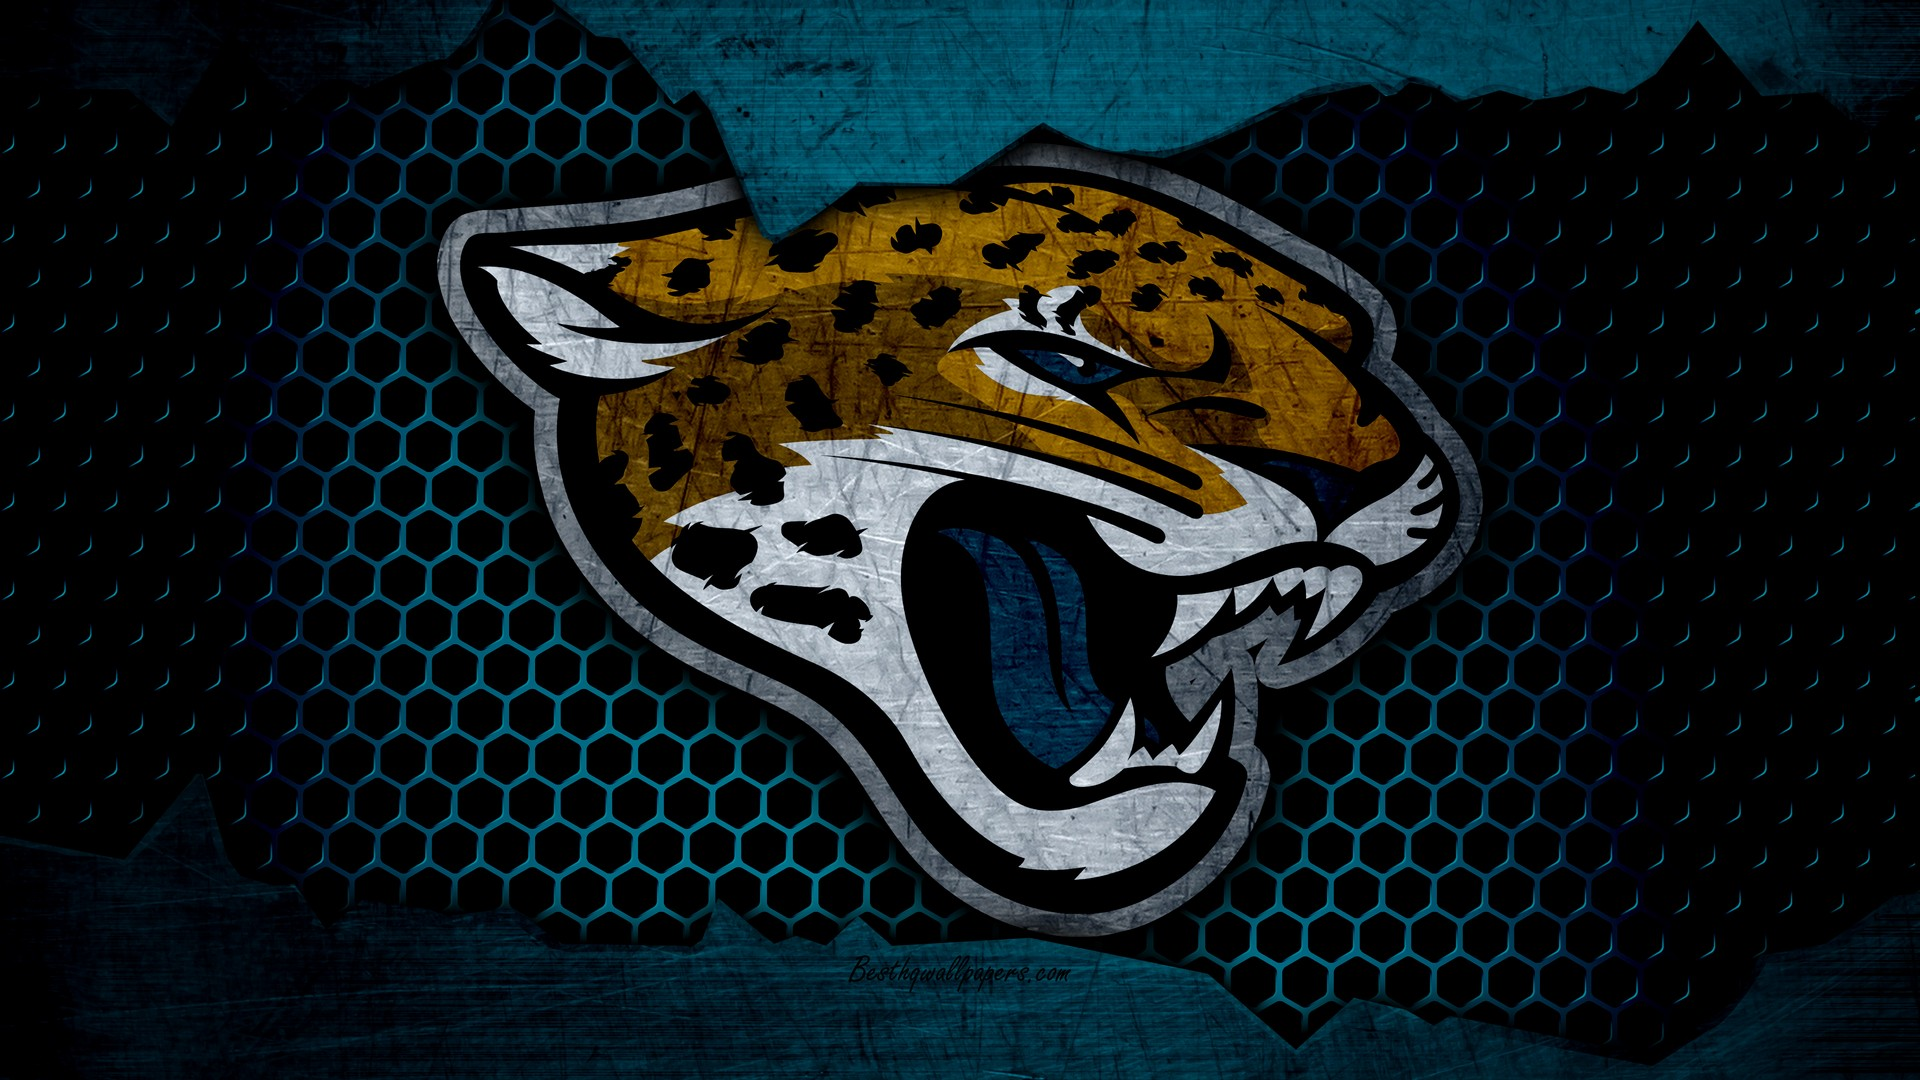 Jacksonville Jaguars Wallpaper HD 2019 NFL Football Wallpapers 1920x1080